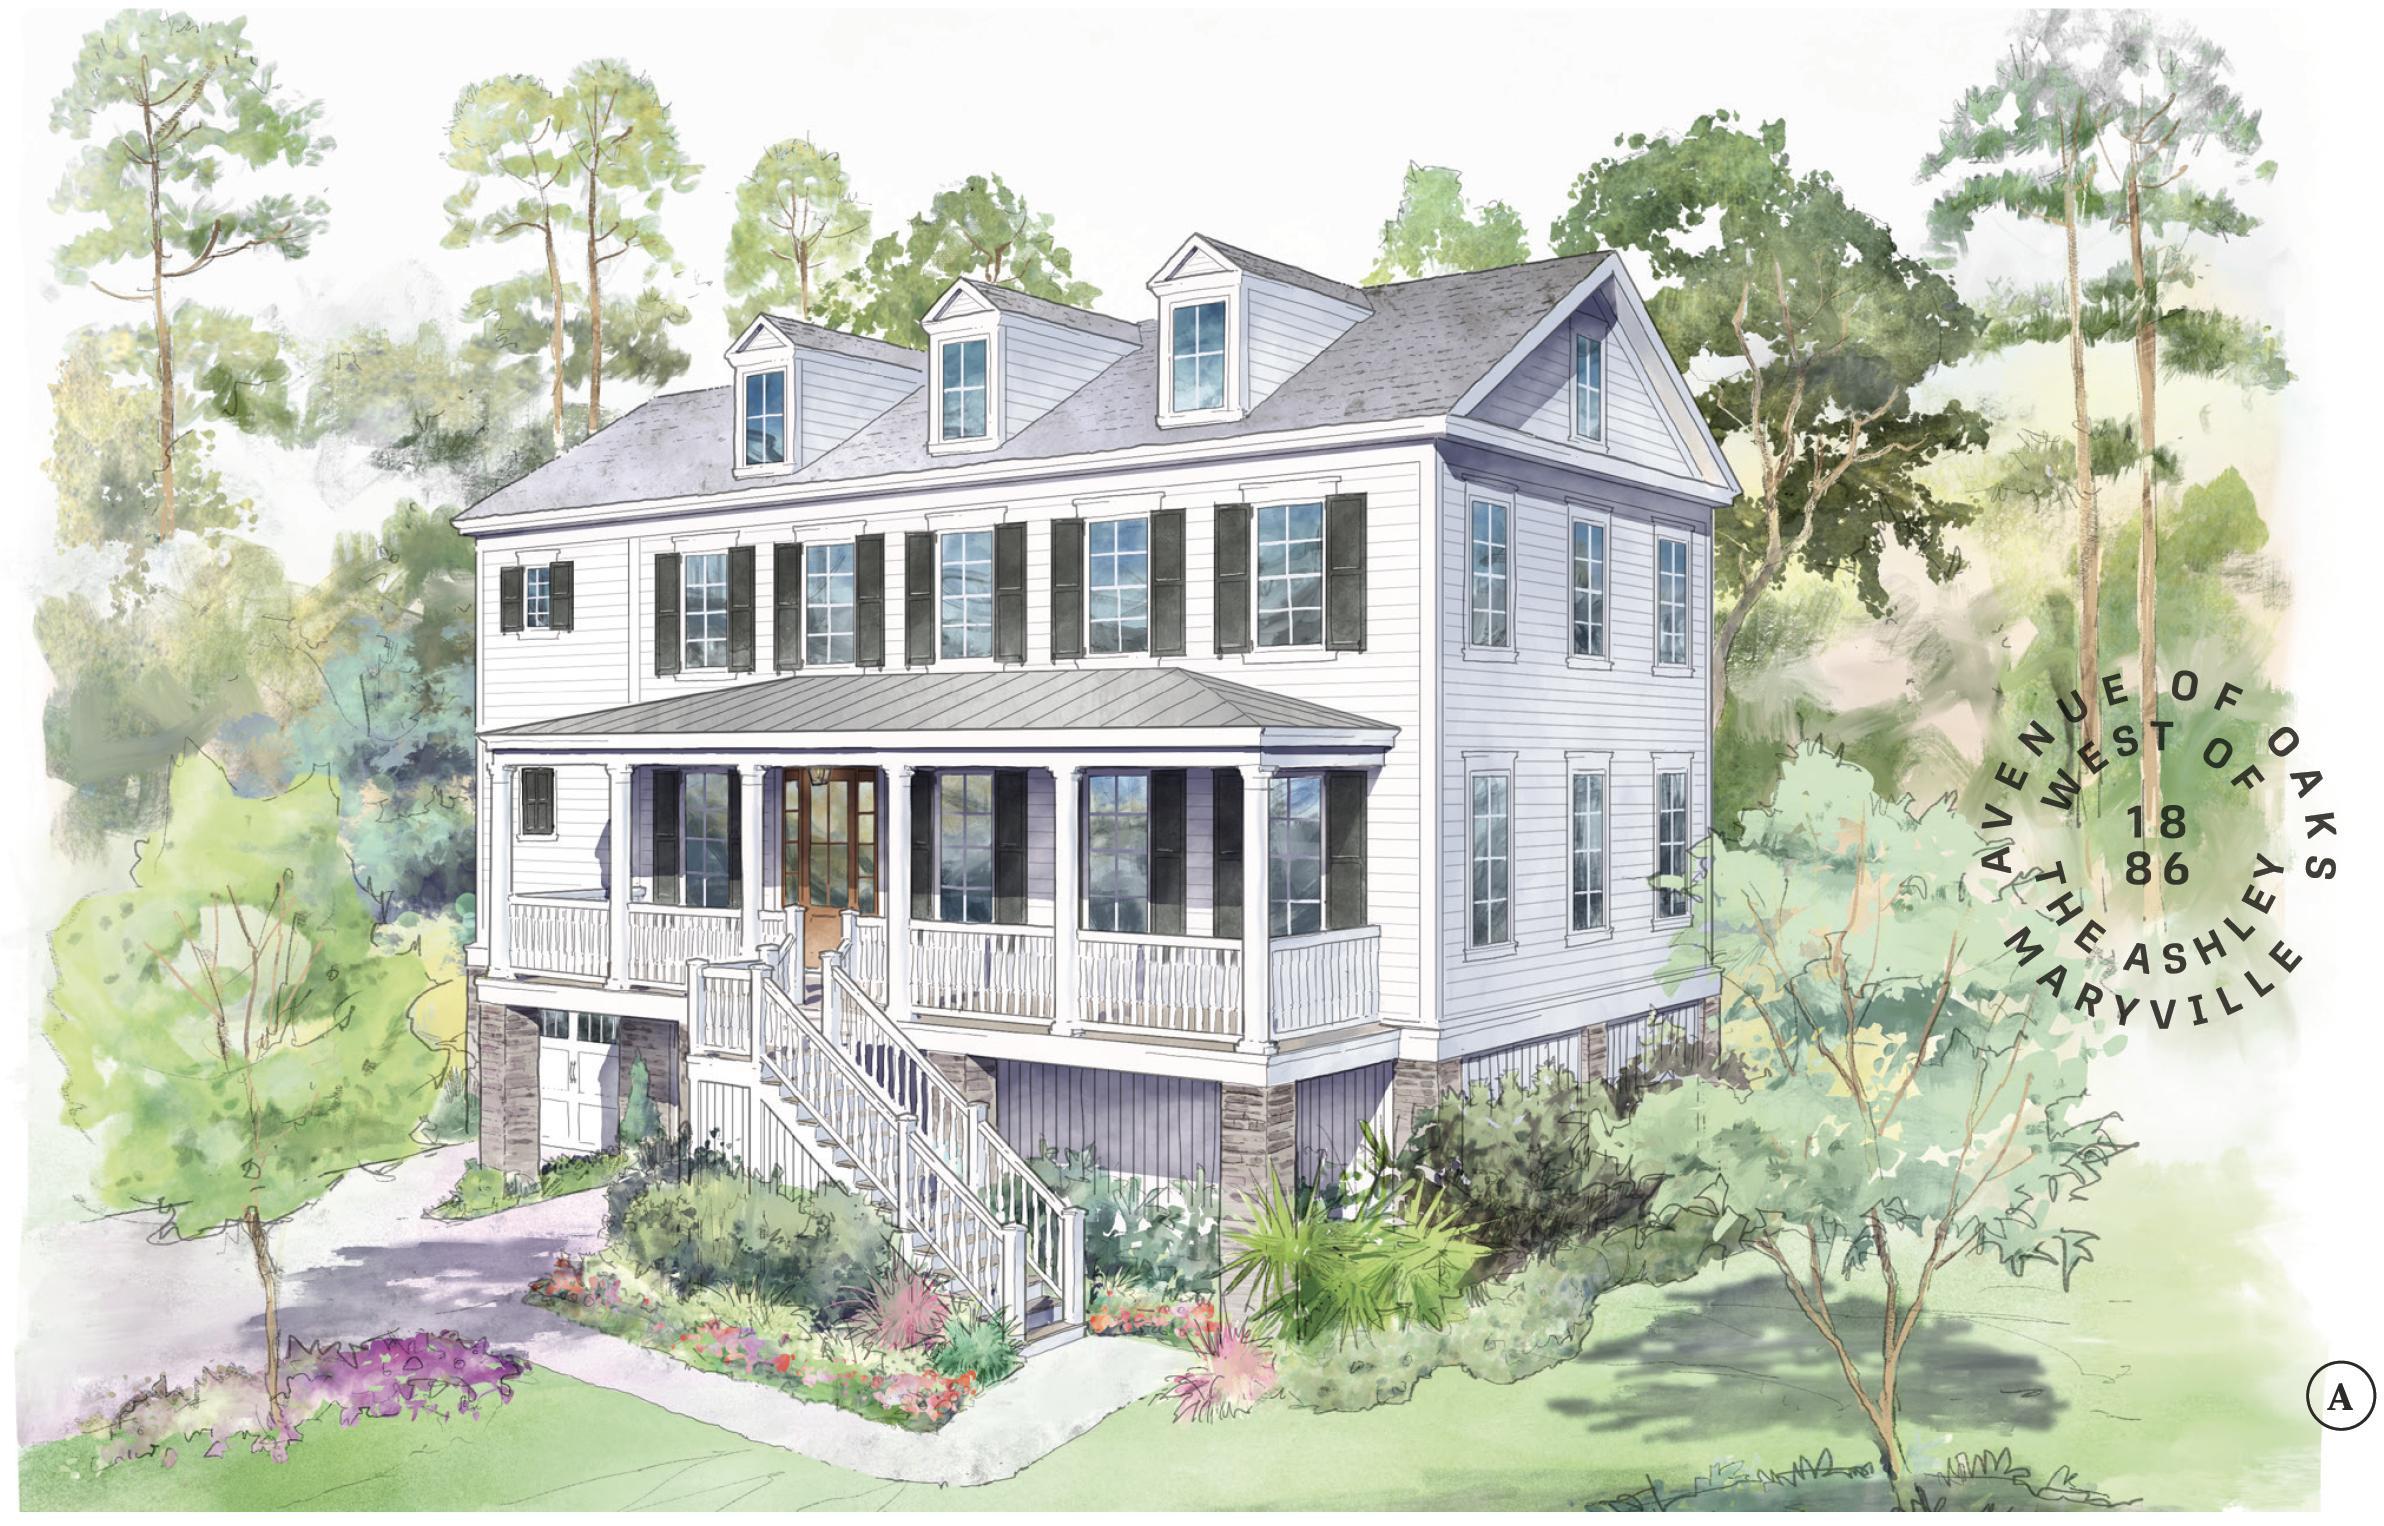 Avenue of Oaks Homes For Sale - 1087 Avenue Of Oaks, Charleston, SC - 0